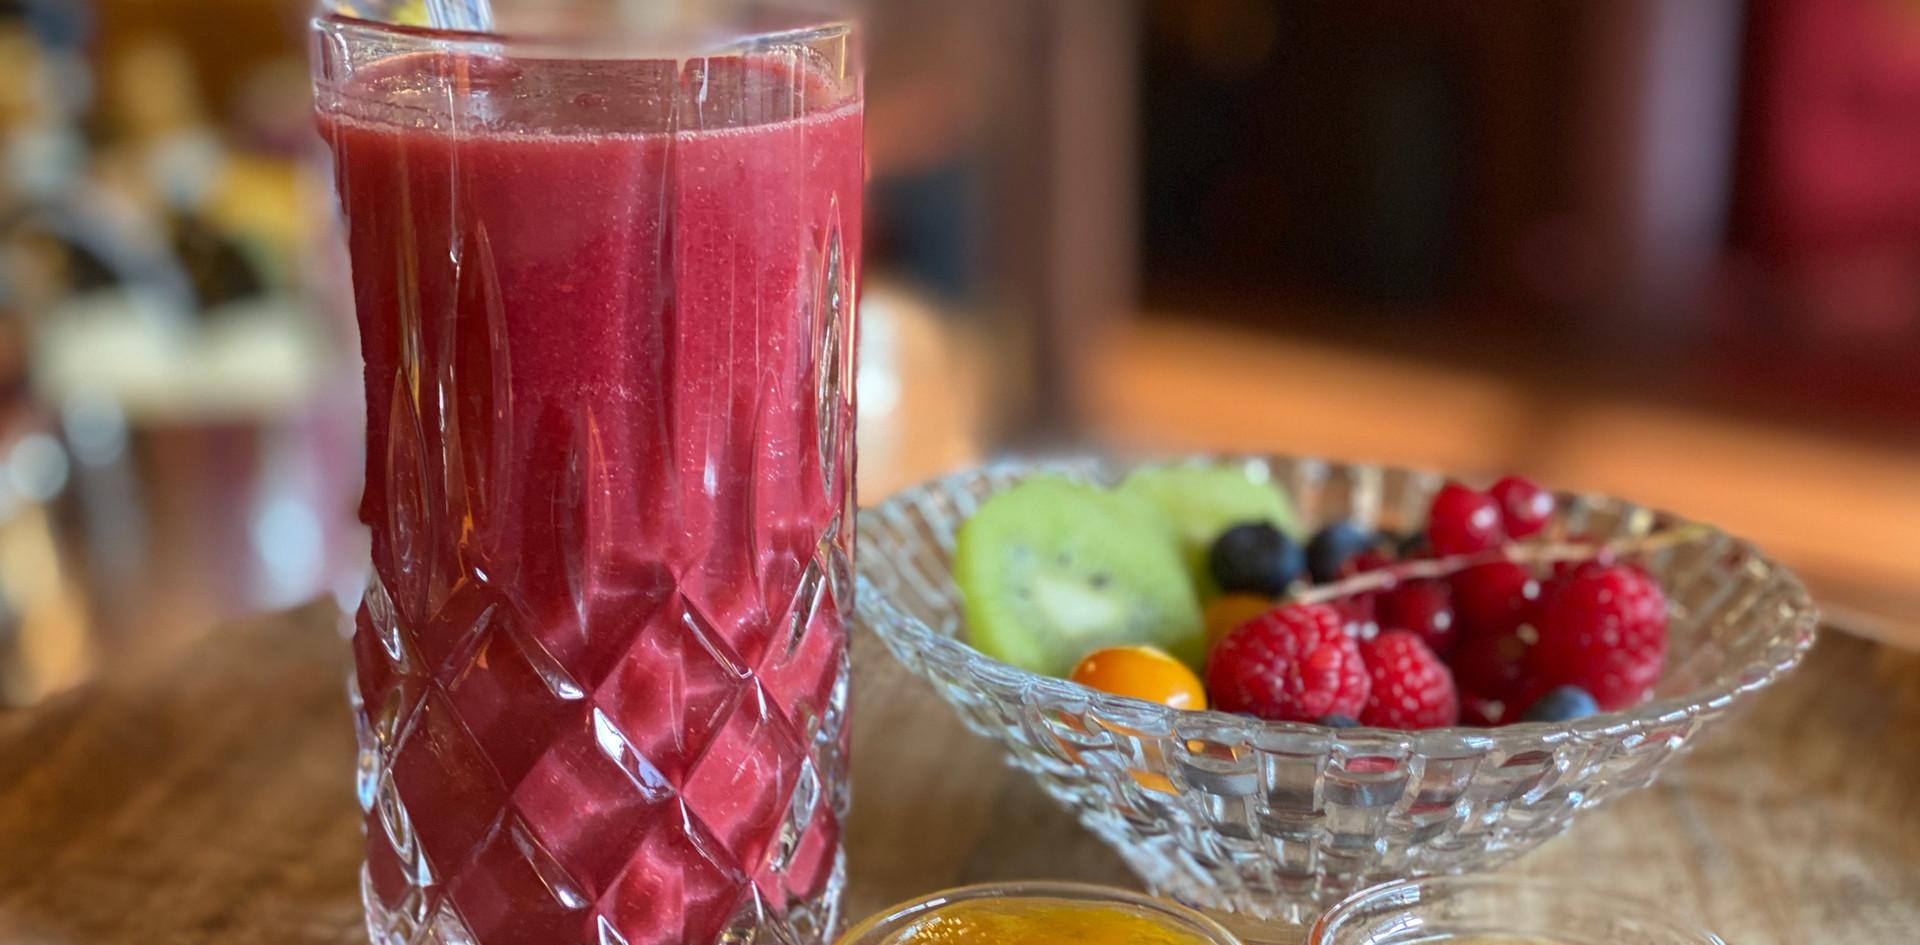 Beerensmoothie Frühstücks-Manufaktur - Hotel Wegner - The culinary Art Hotel